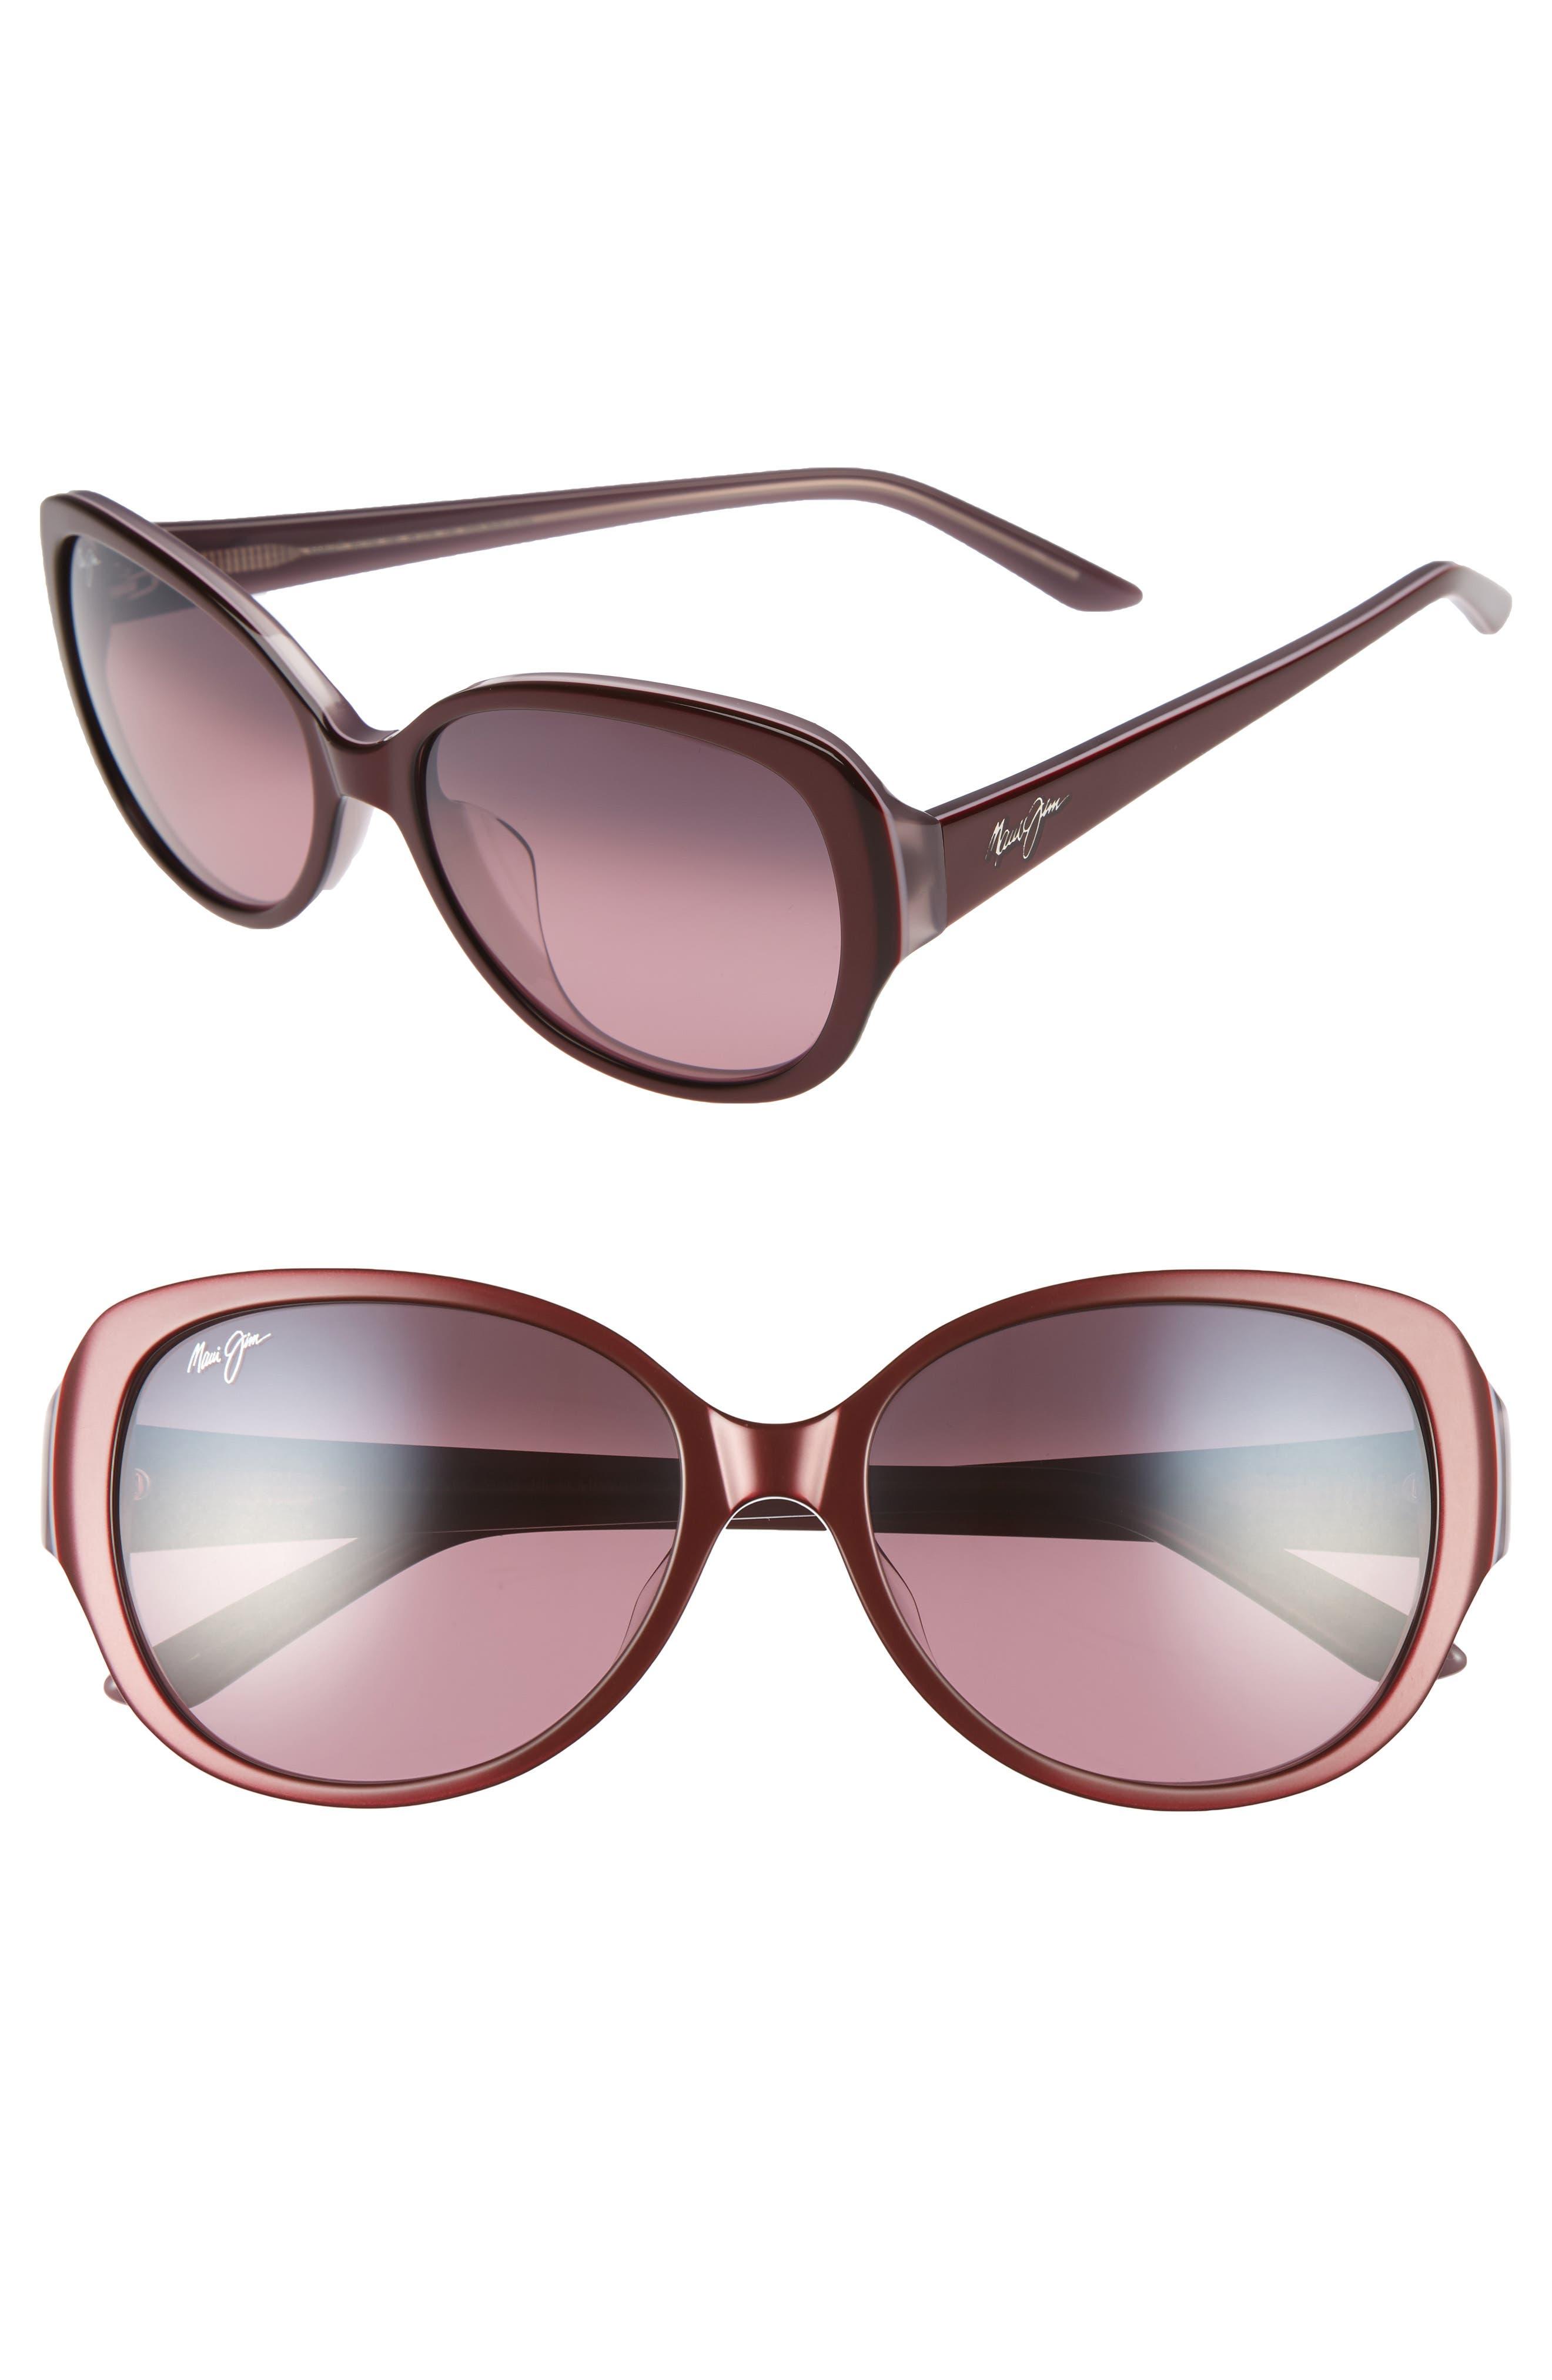 Maui Jim Swept Away 5m Polarizedplus2 Sunglasses - Ruby/ Mauve/ Maui Rose